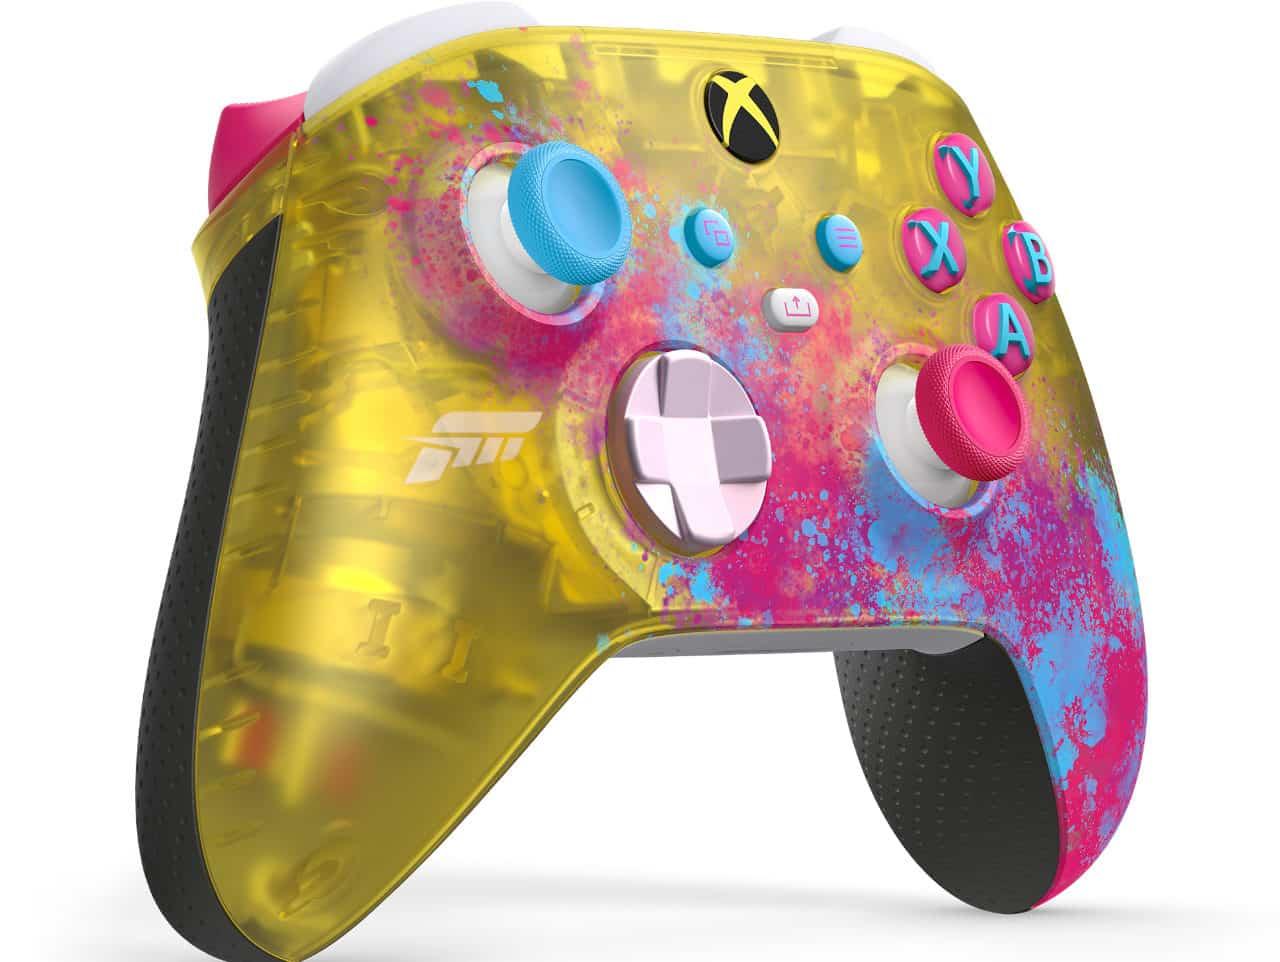 Xbox Wireless Controller Forza Horizon 5